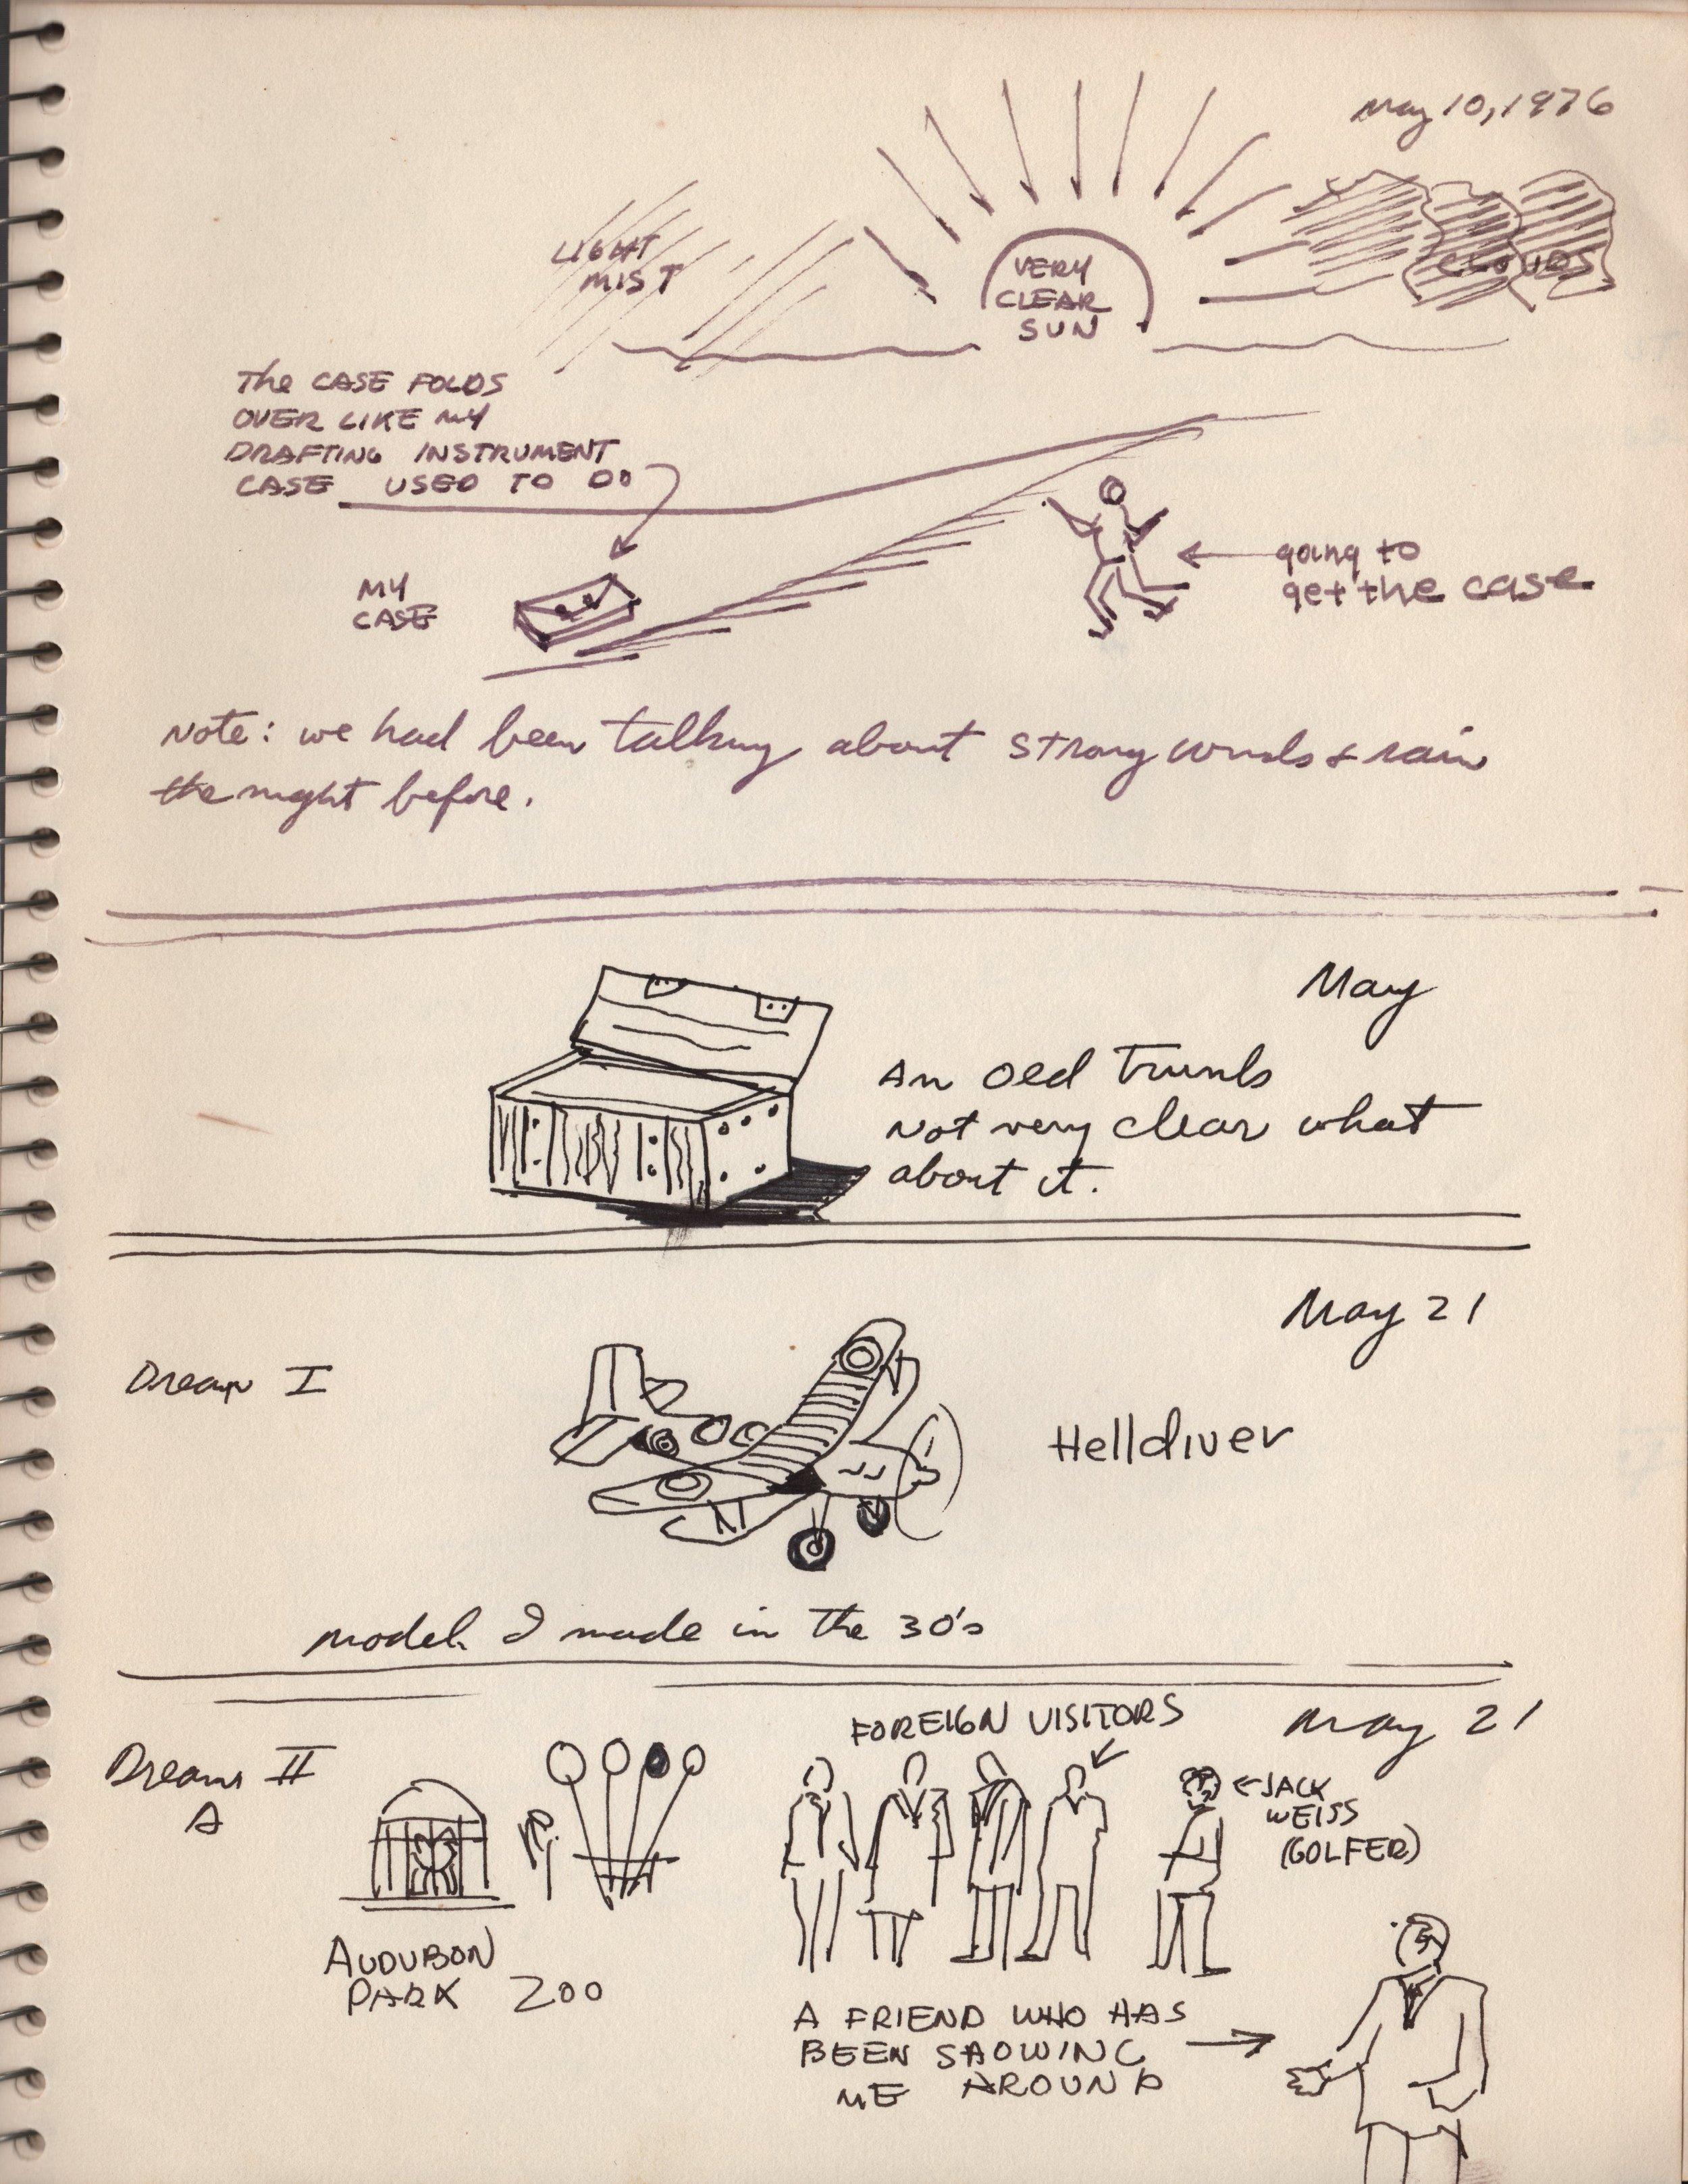 Dreams Book I (1976)_008.jpg